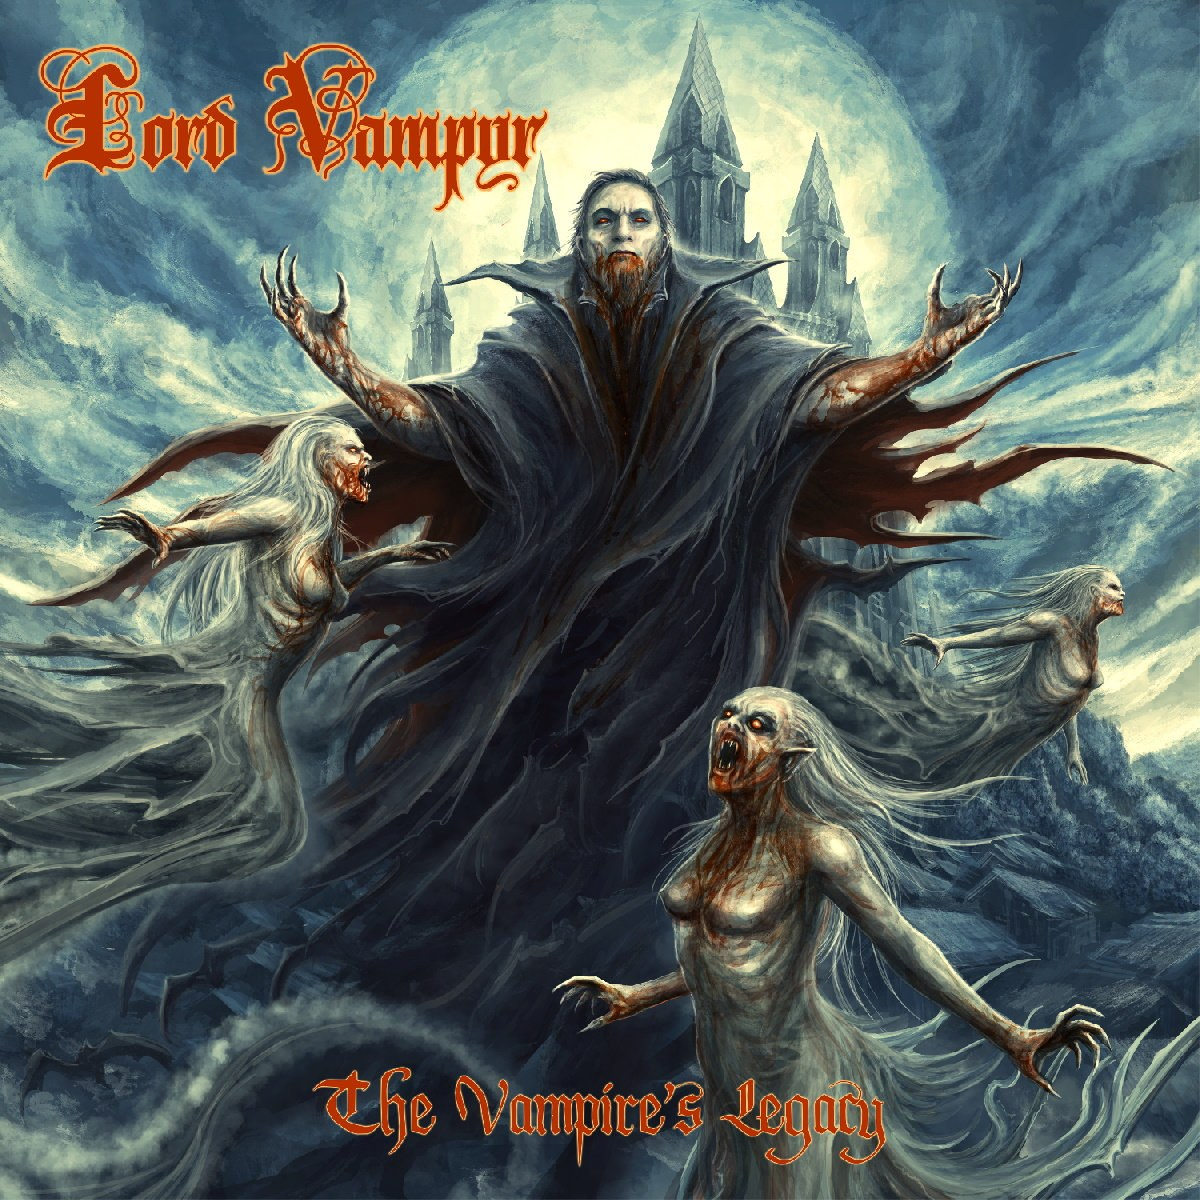 Lord Vampyr - The Vampire's Legacy